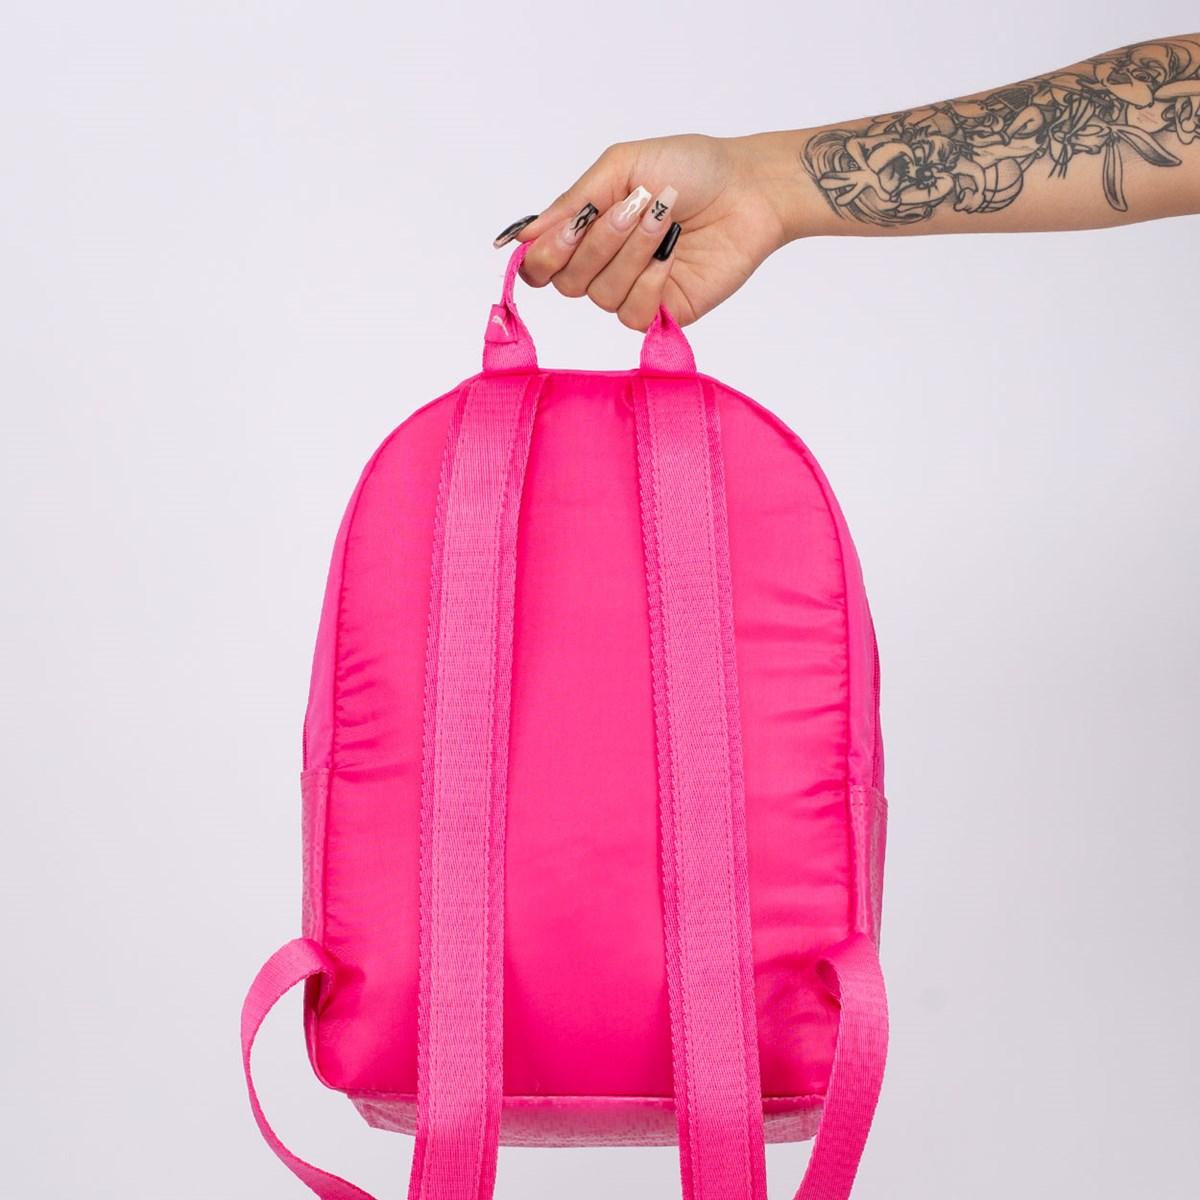 Mochila Puma Prime Time Backpack Pink 077401-02